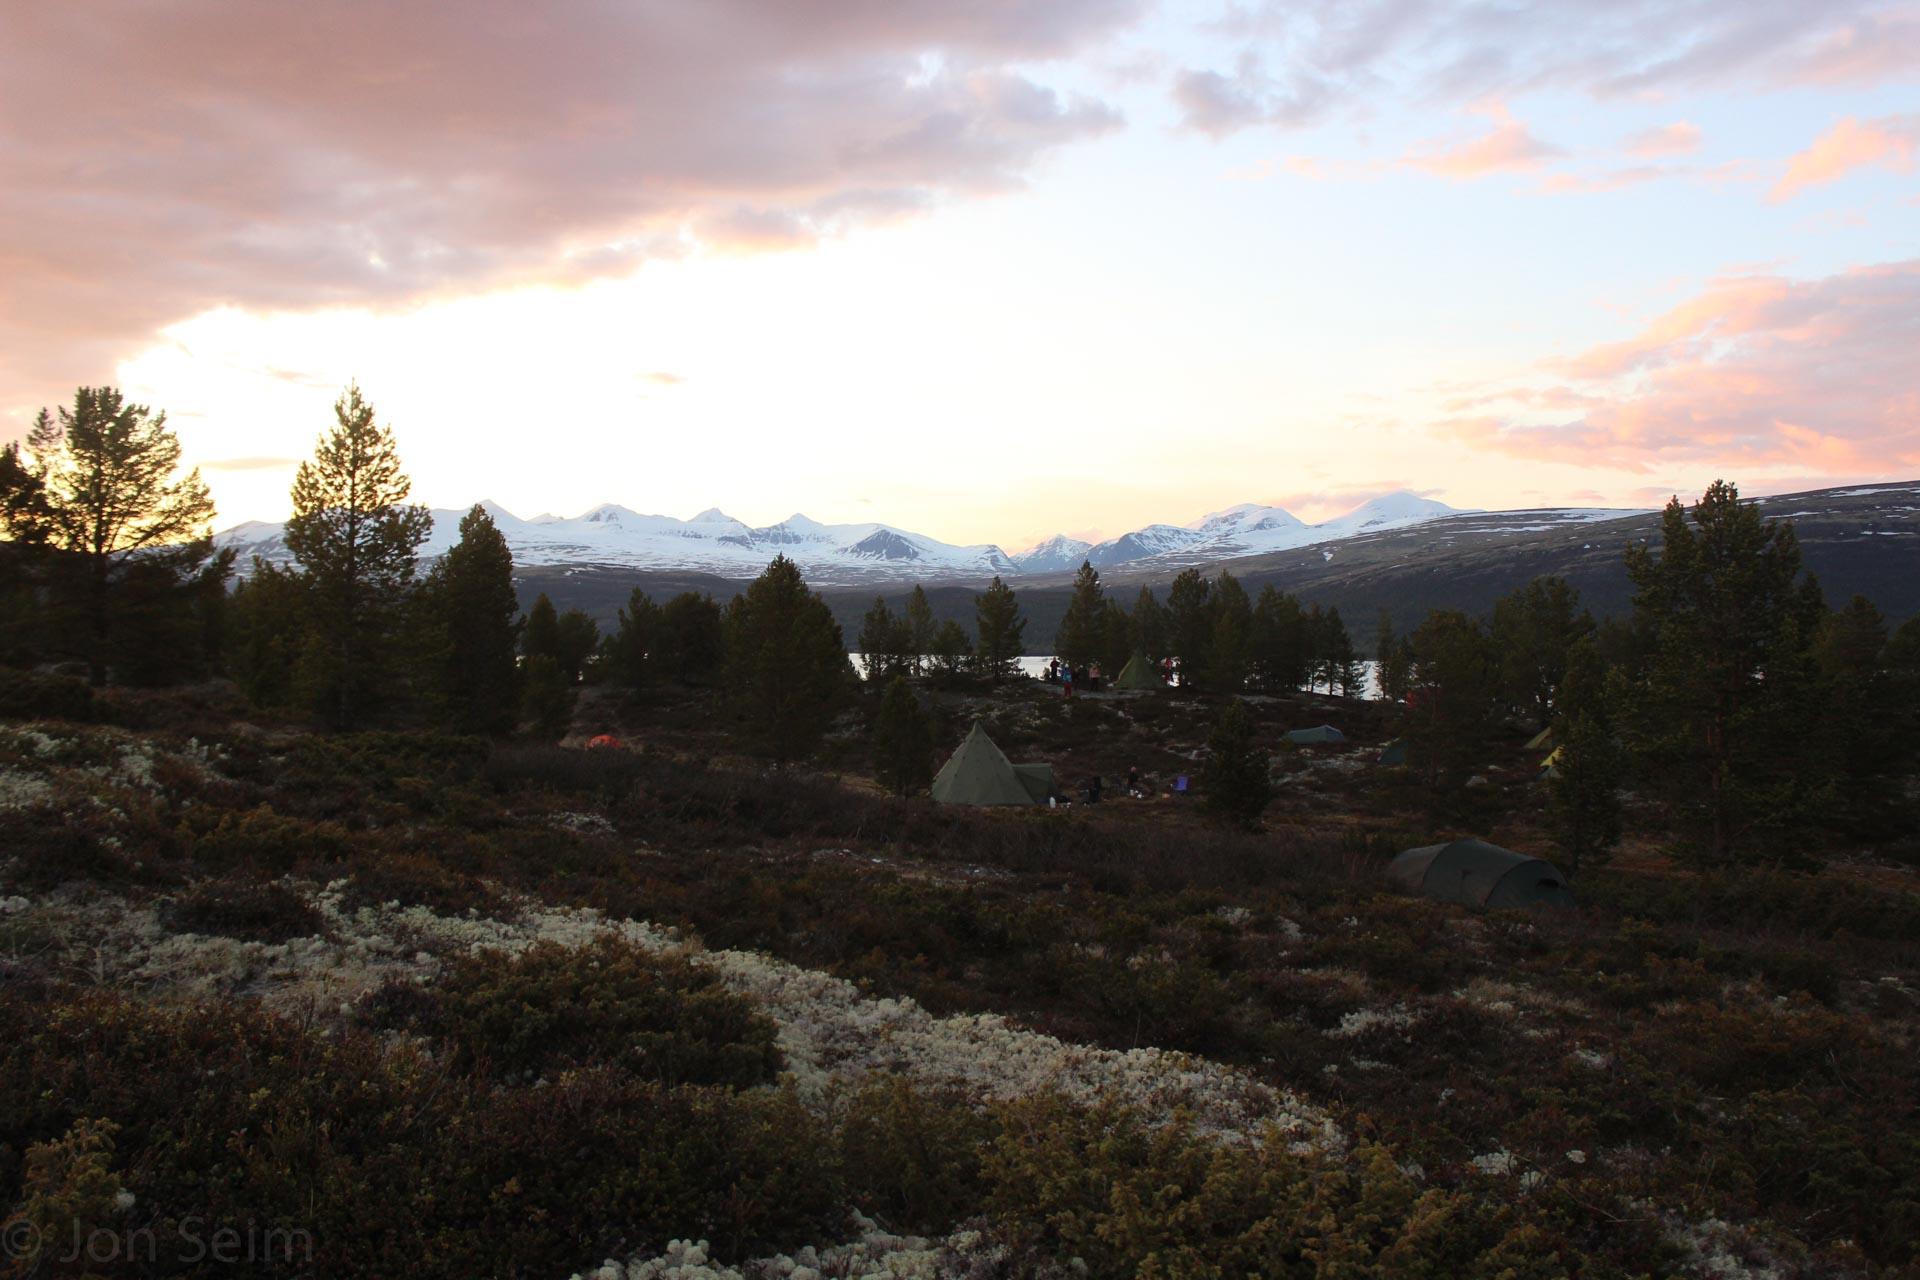 Solnedgang over Rondane